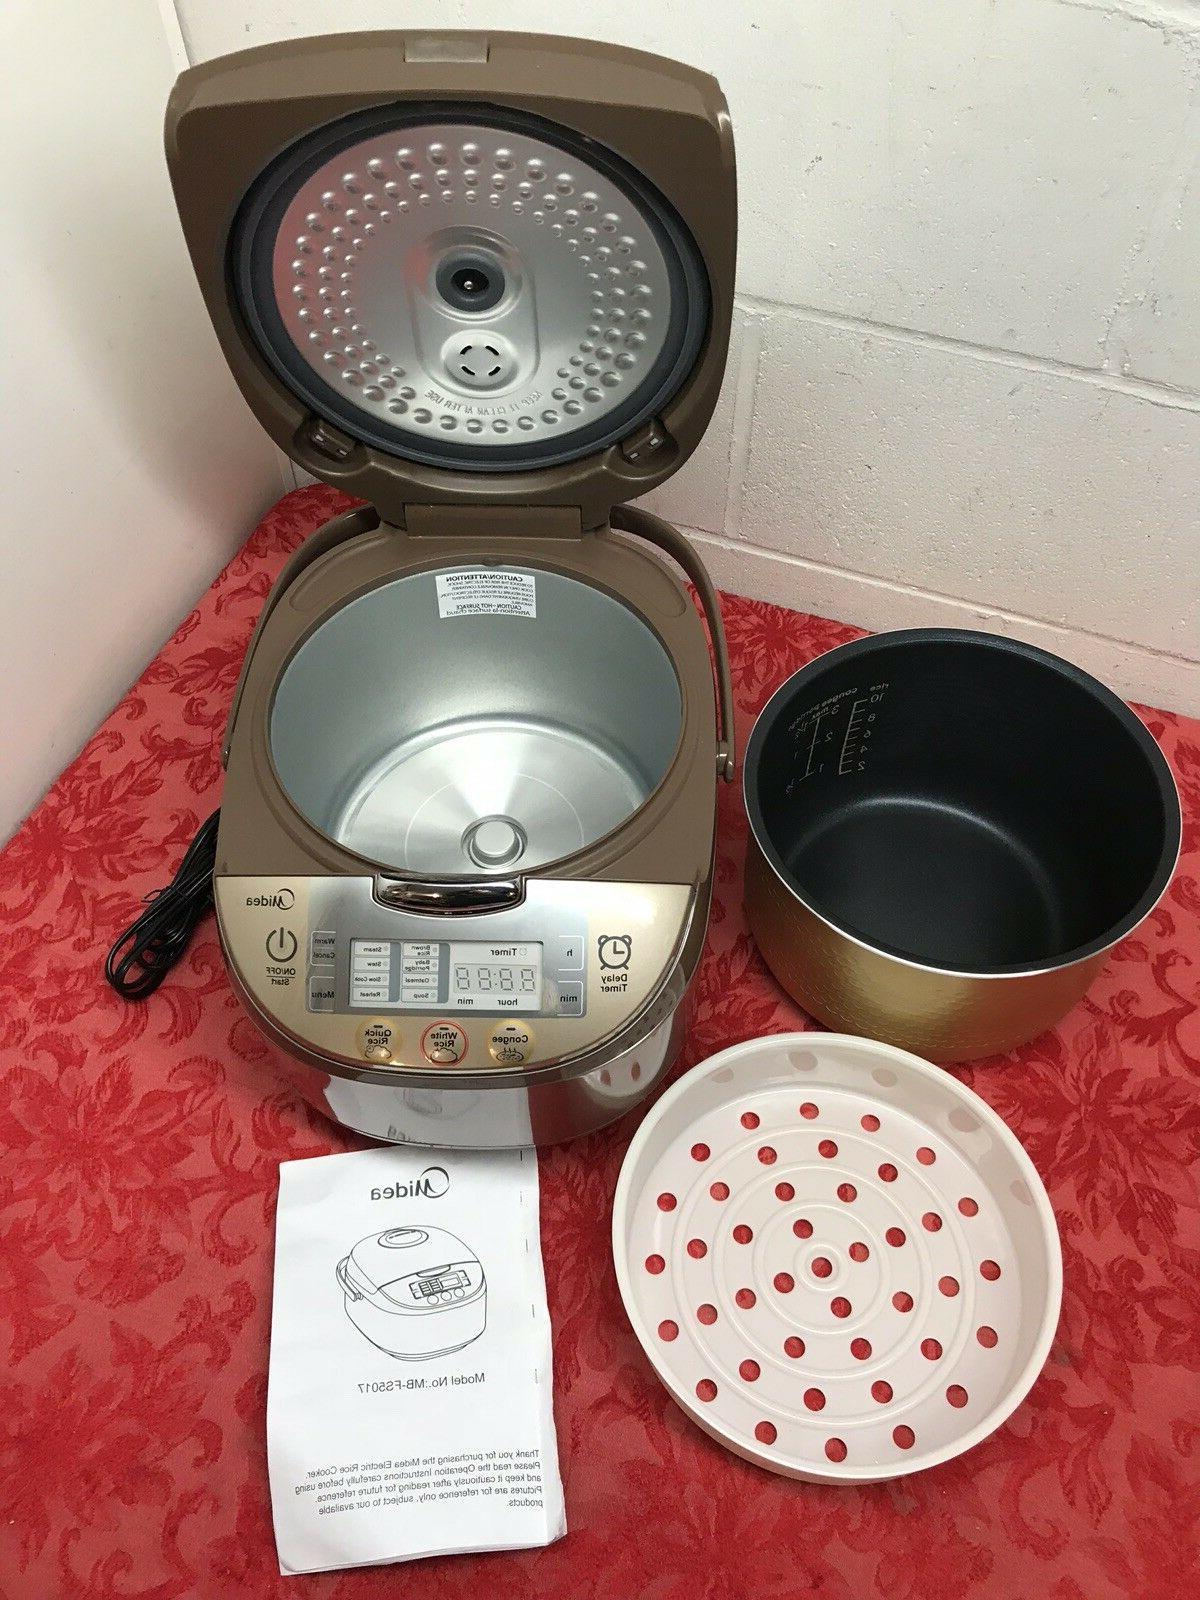 Midea Mb-fs5017 10 Smart Slow Cook